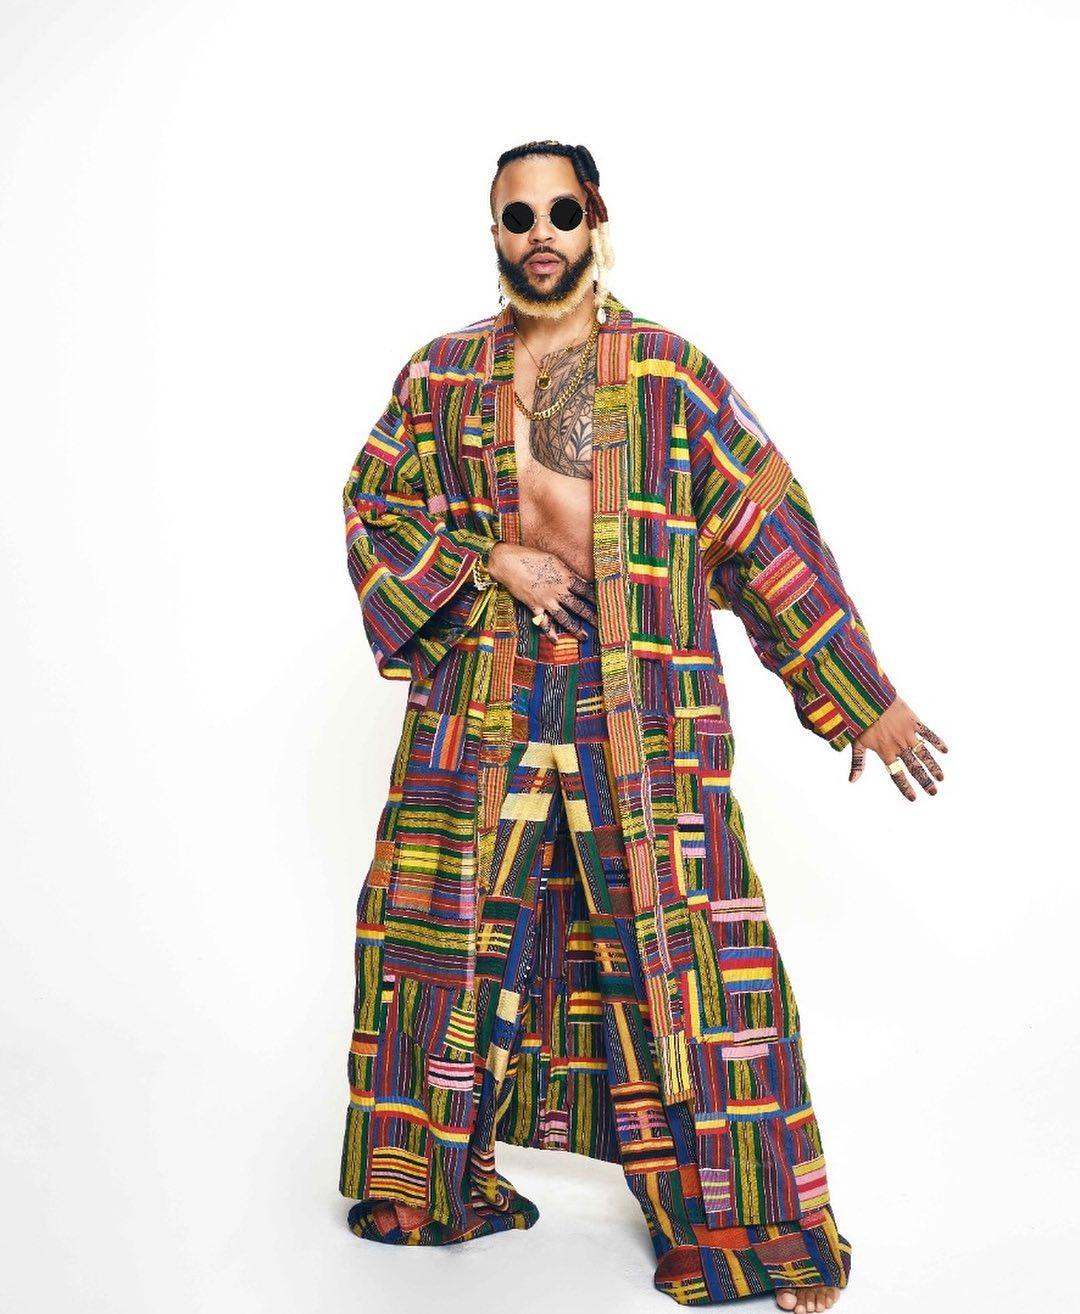 best-dressed-world-stylish-black-male-celebrities-style-rave